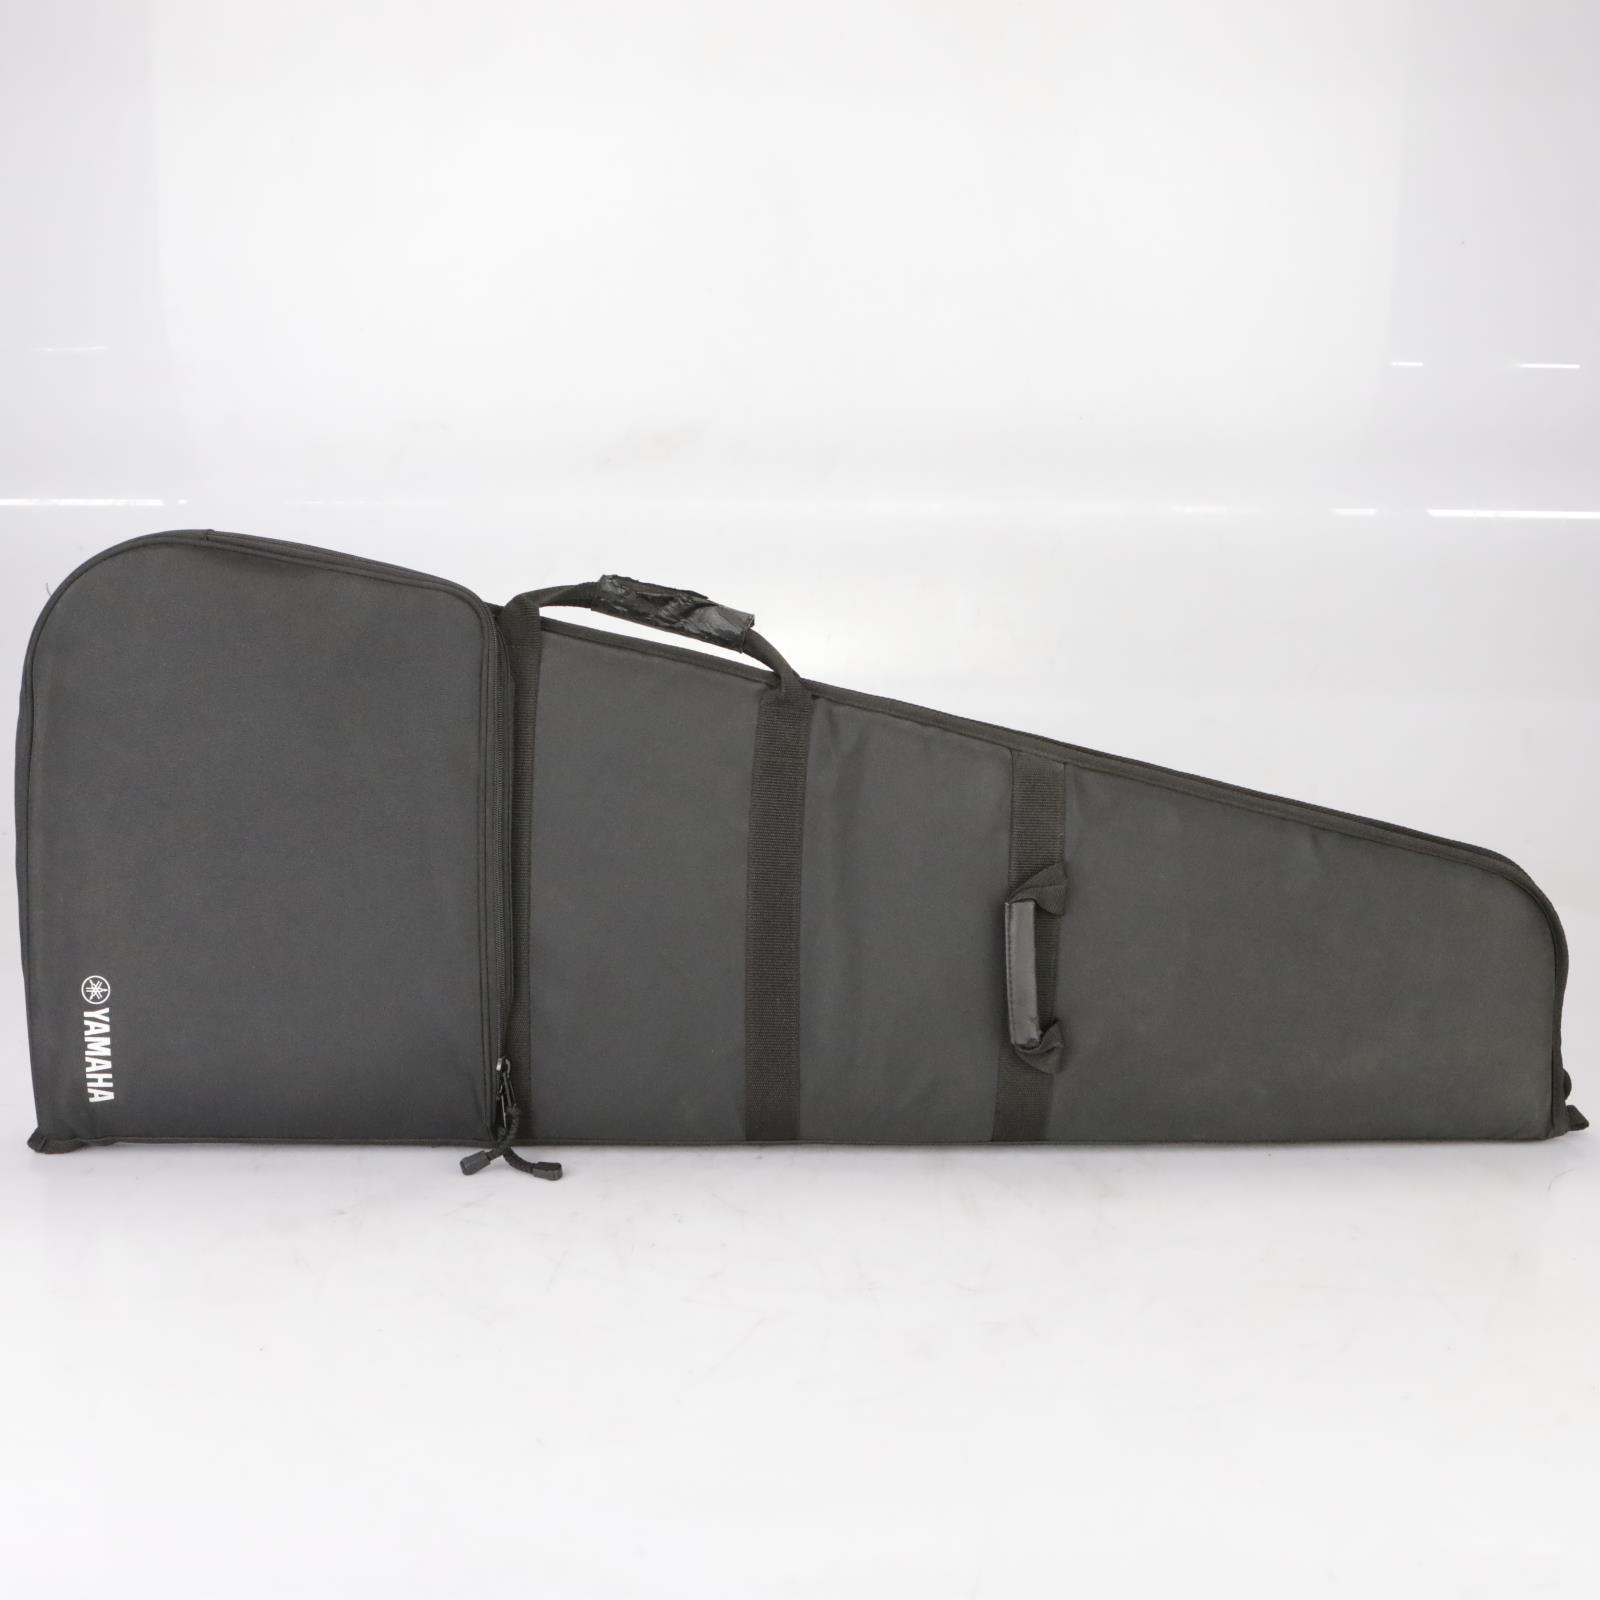 Yamaha Bass Guitar Padded Gig Bag Backpack owned by Leland Sklar #38871